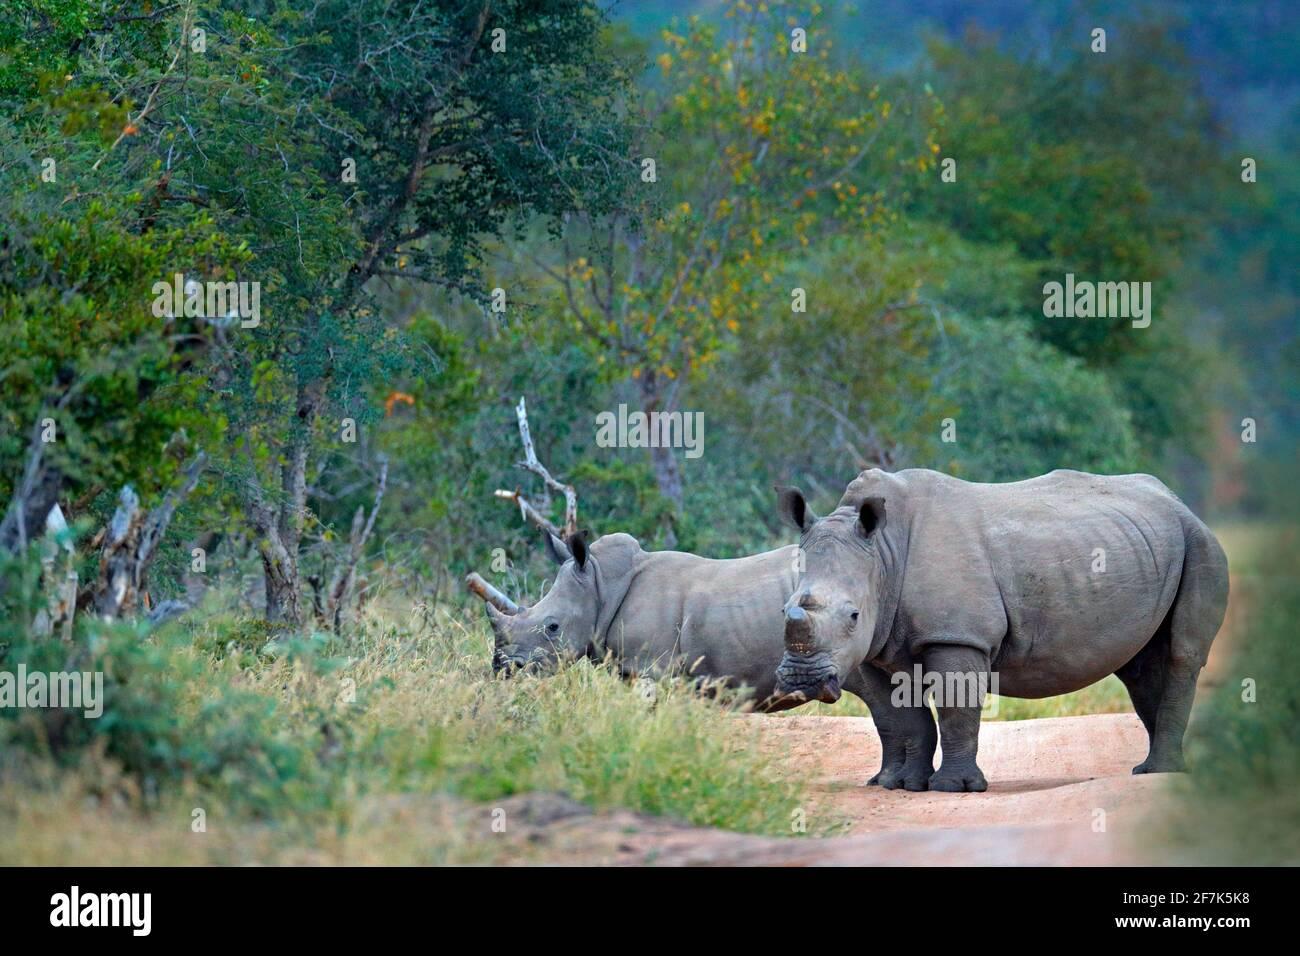 Rhino in forest habitat. Two White rhinoceros, Ceratotherium simum, with cut horns, in the nature habitat, Kruger NAtional Park. Africa. Wildlife scen Stock Photo